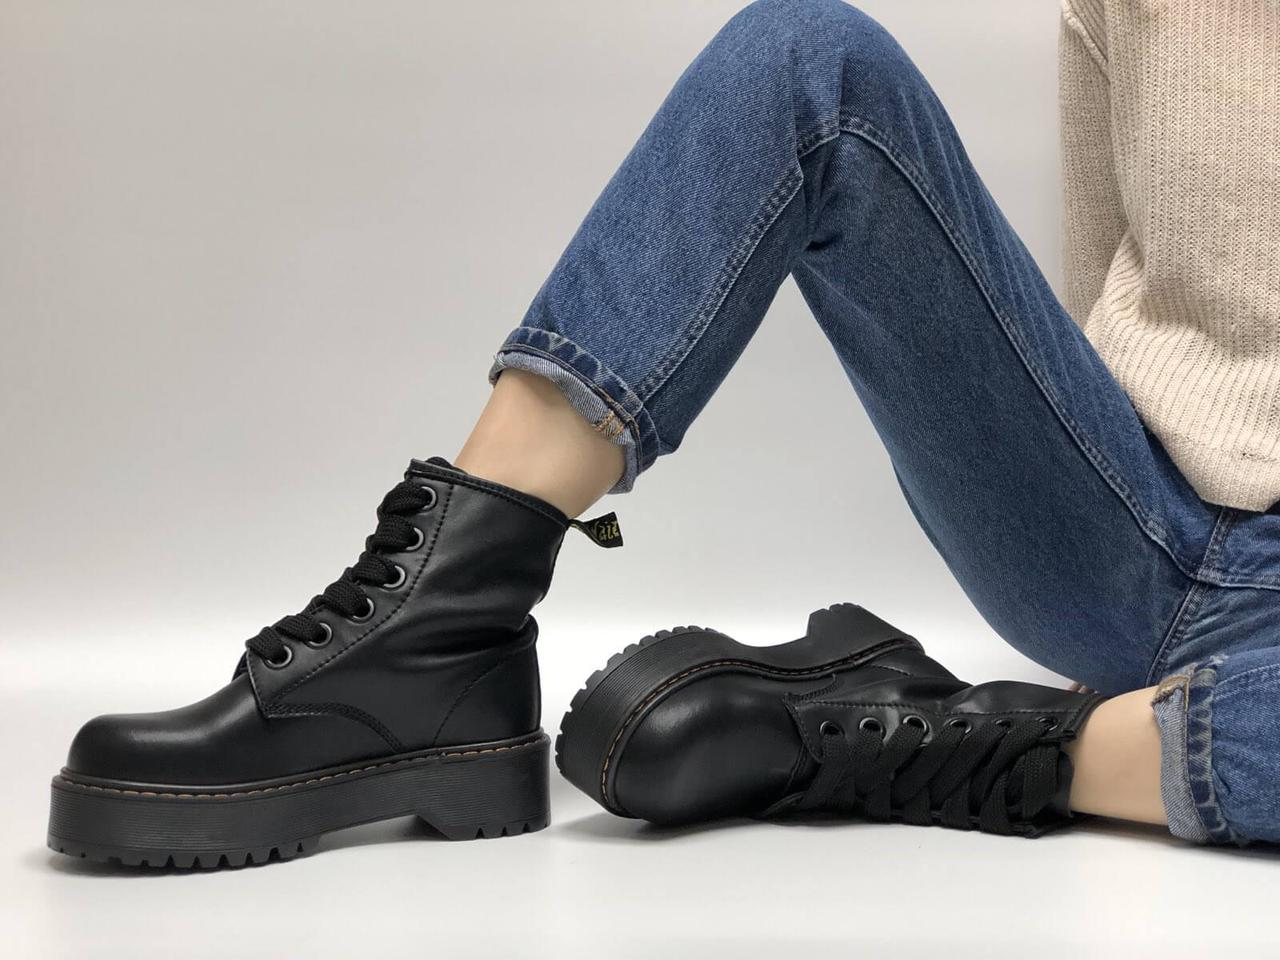 Ботинки Доктор Мартинс